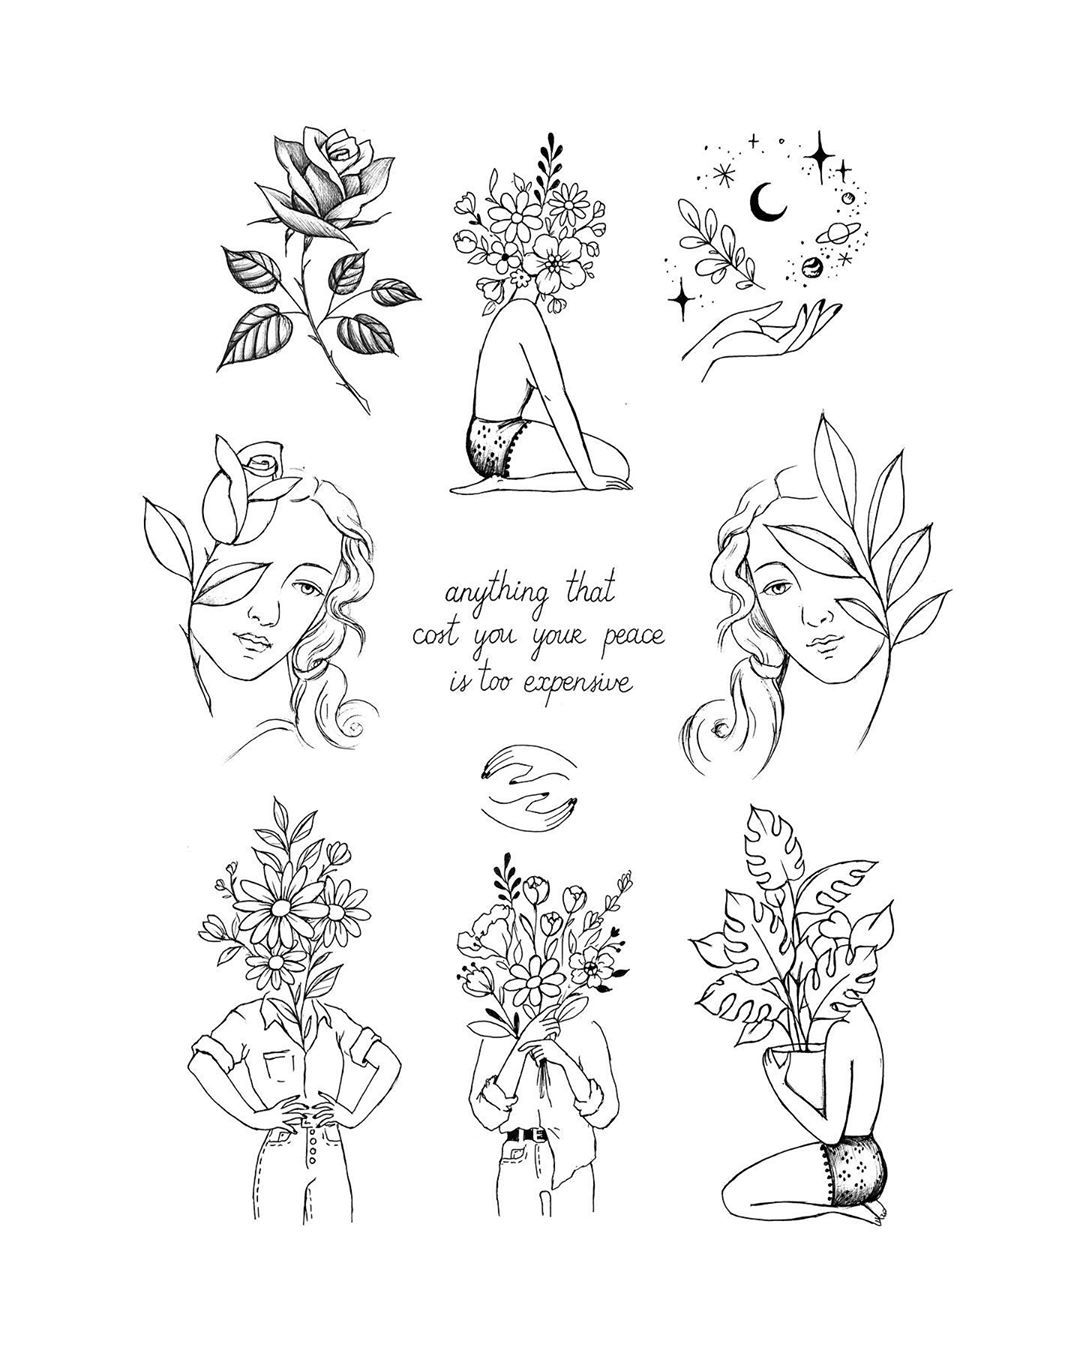 3 153 Curtidas 12 Comentarios Julia Mo Honey Im Home Tattoo No Instagram In 2020 Line Art Drawings Floral Drawing Book Art